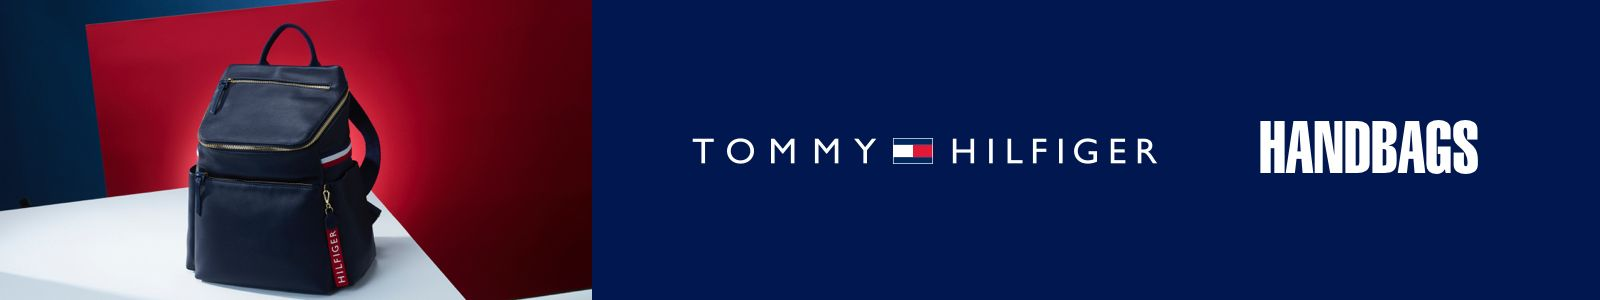 Tommy Hilfiger, Handbags